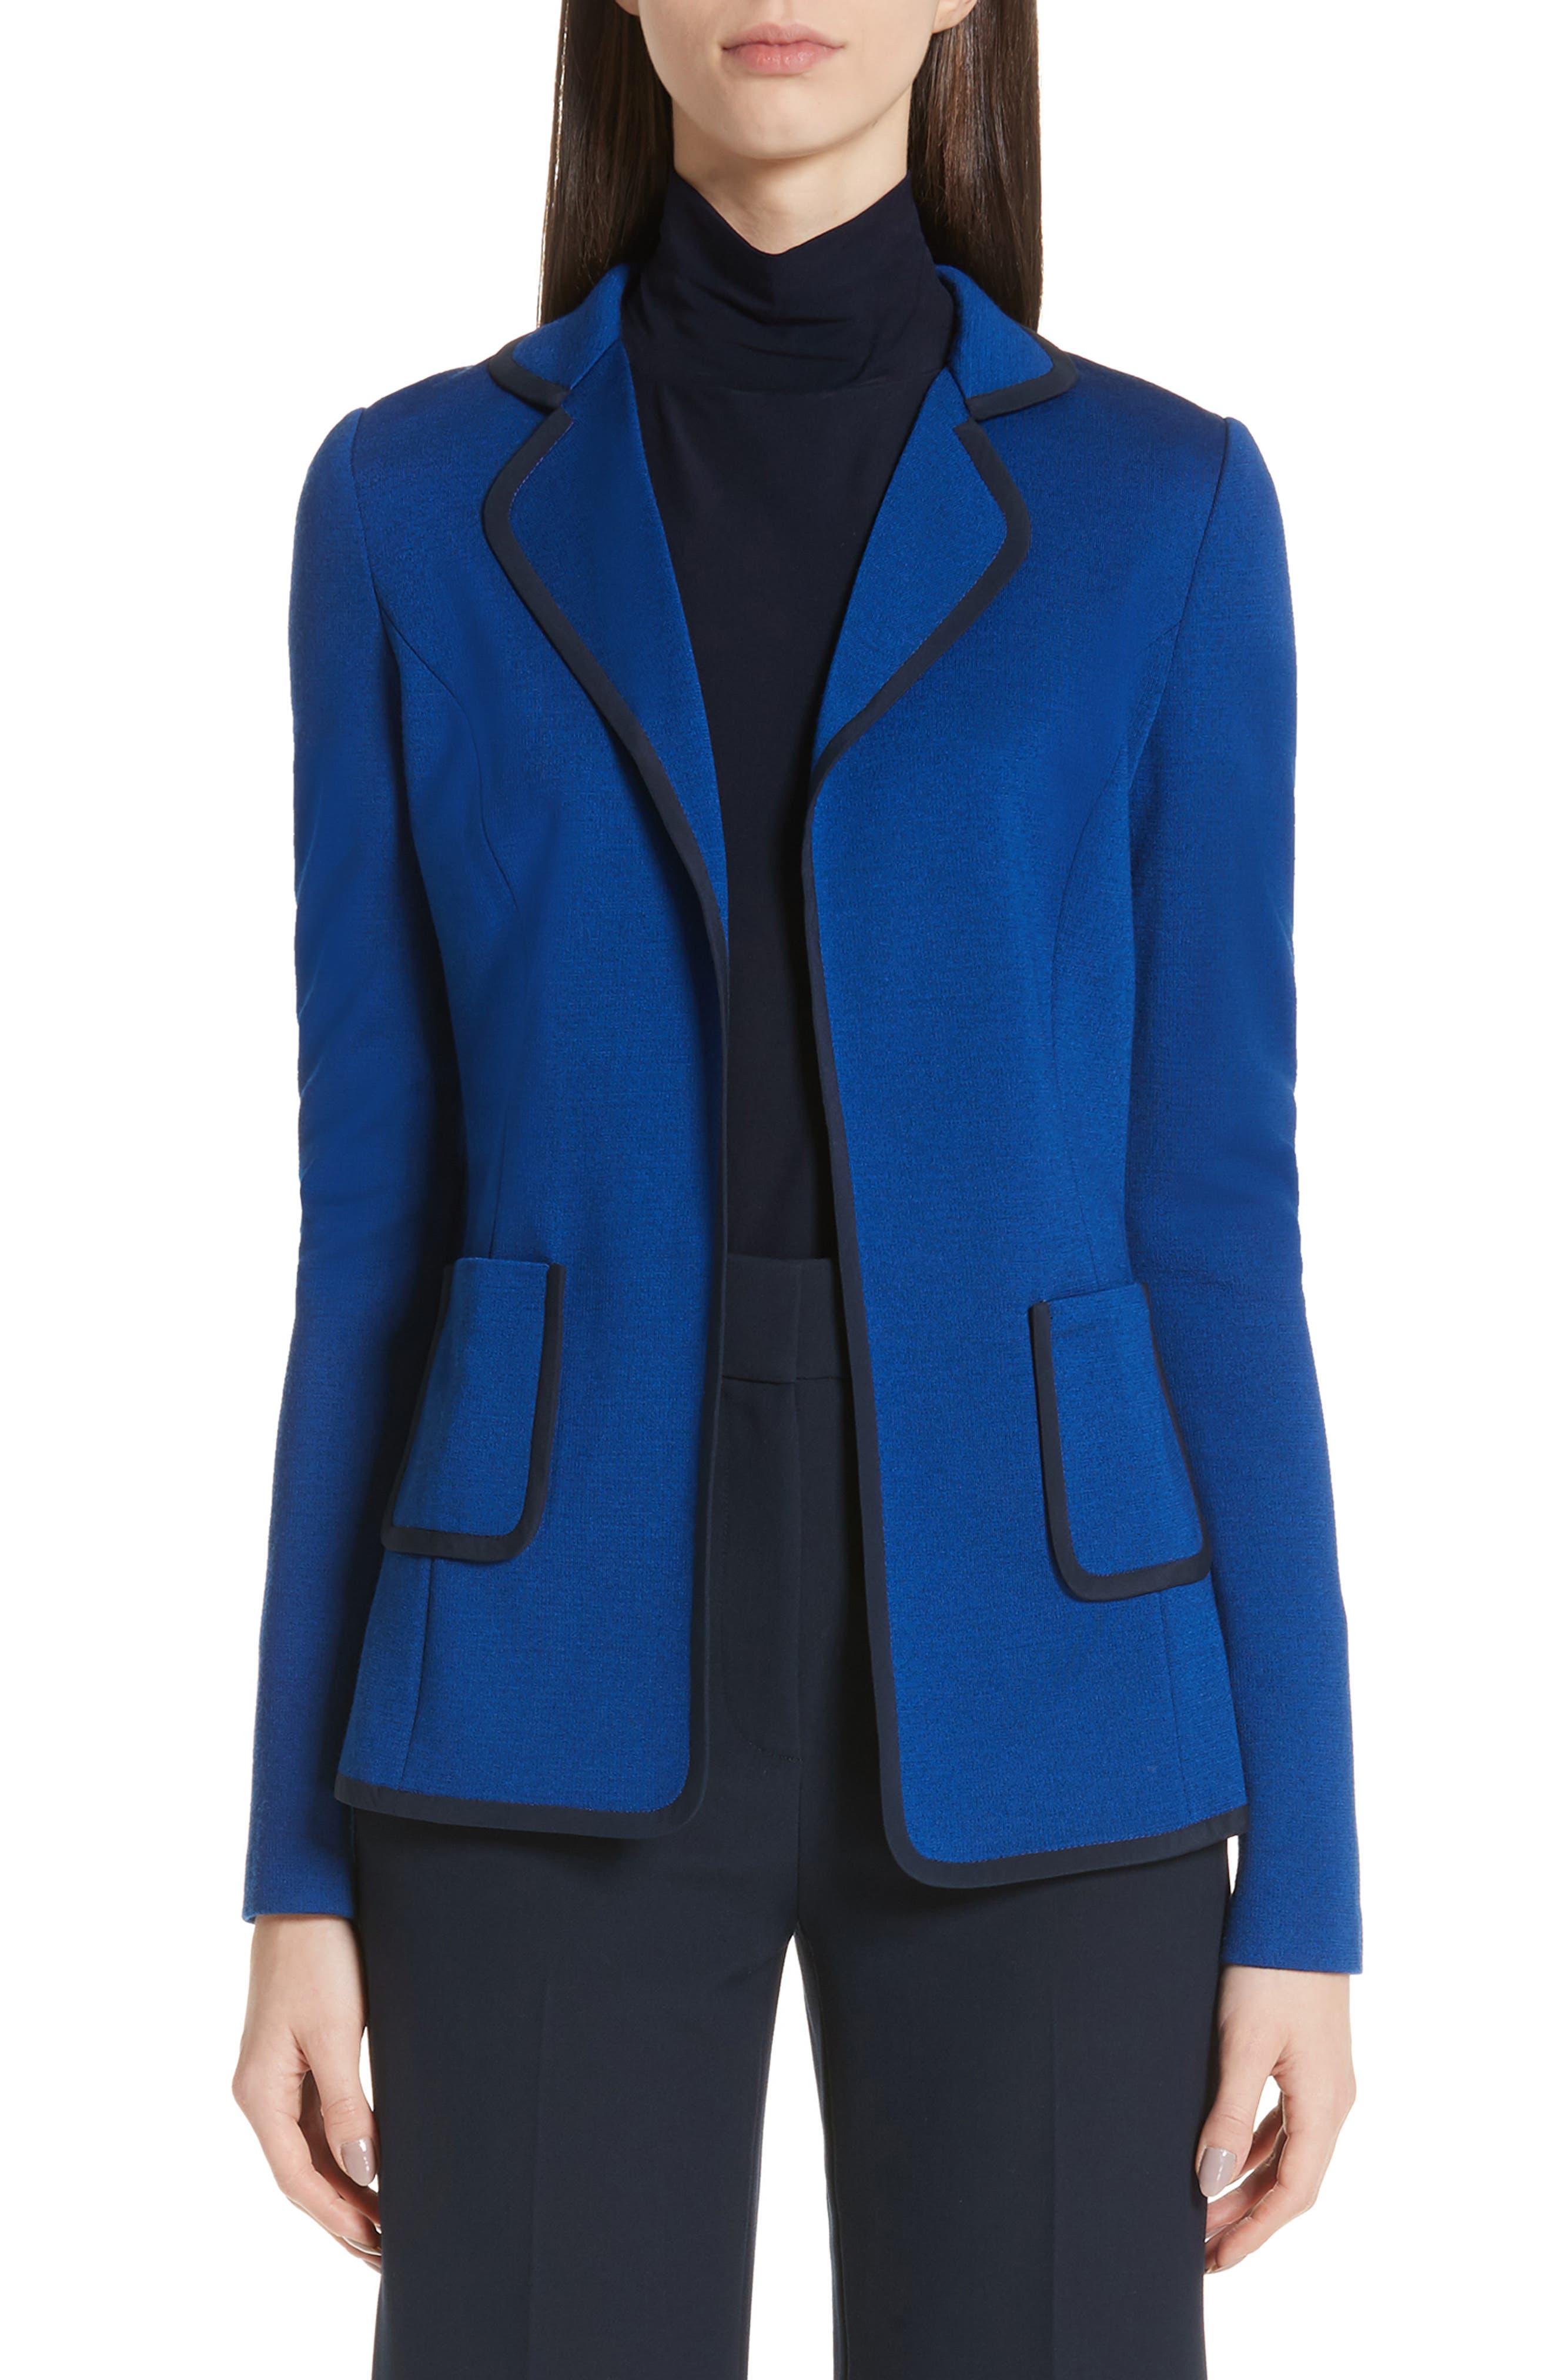 ST. JOHN COLLECTION, Patch Pocket Milano Knit Jacket, Main thumbnail 1, color, AZUL/ NAVY